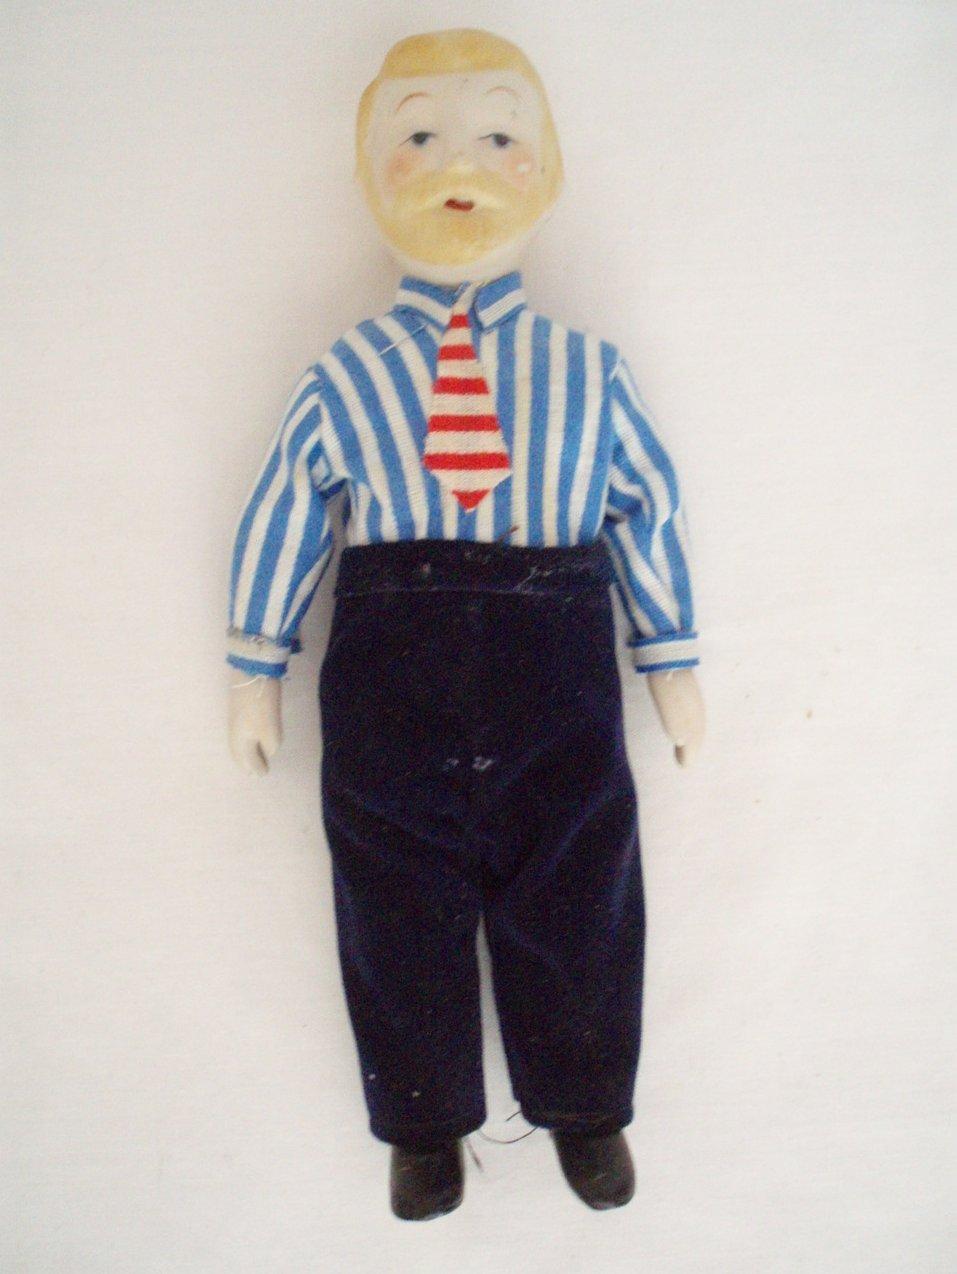 dollhouse miniature people man  Grandfather vintage